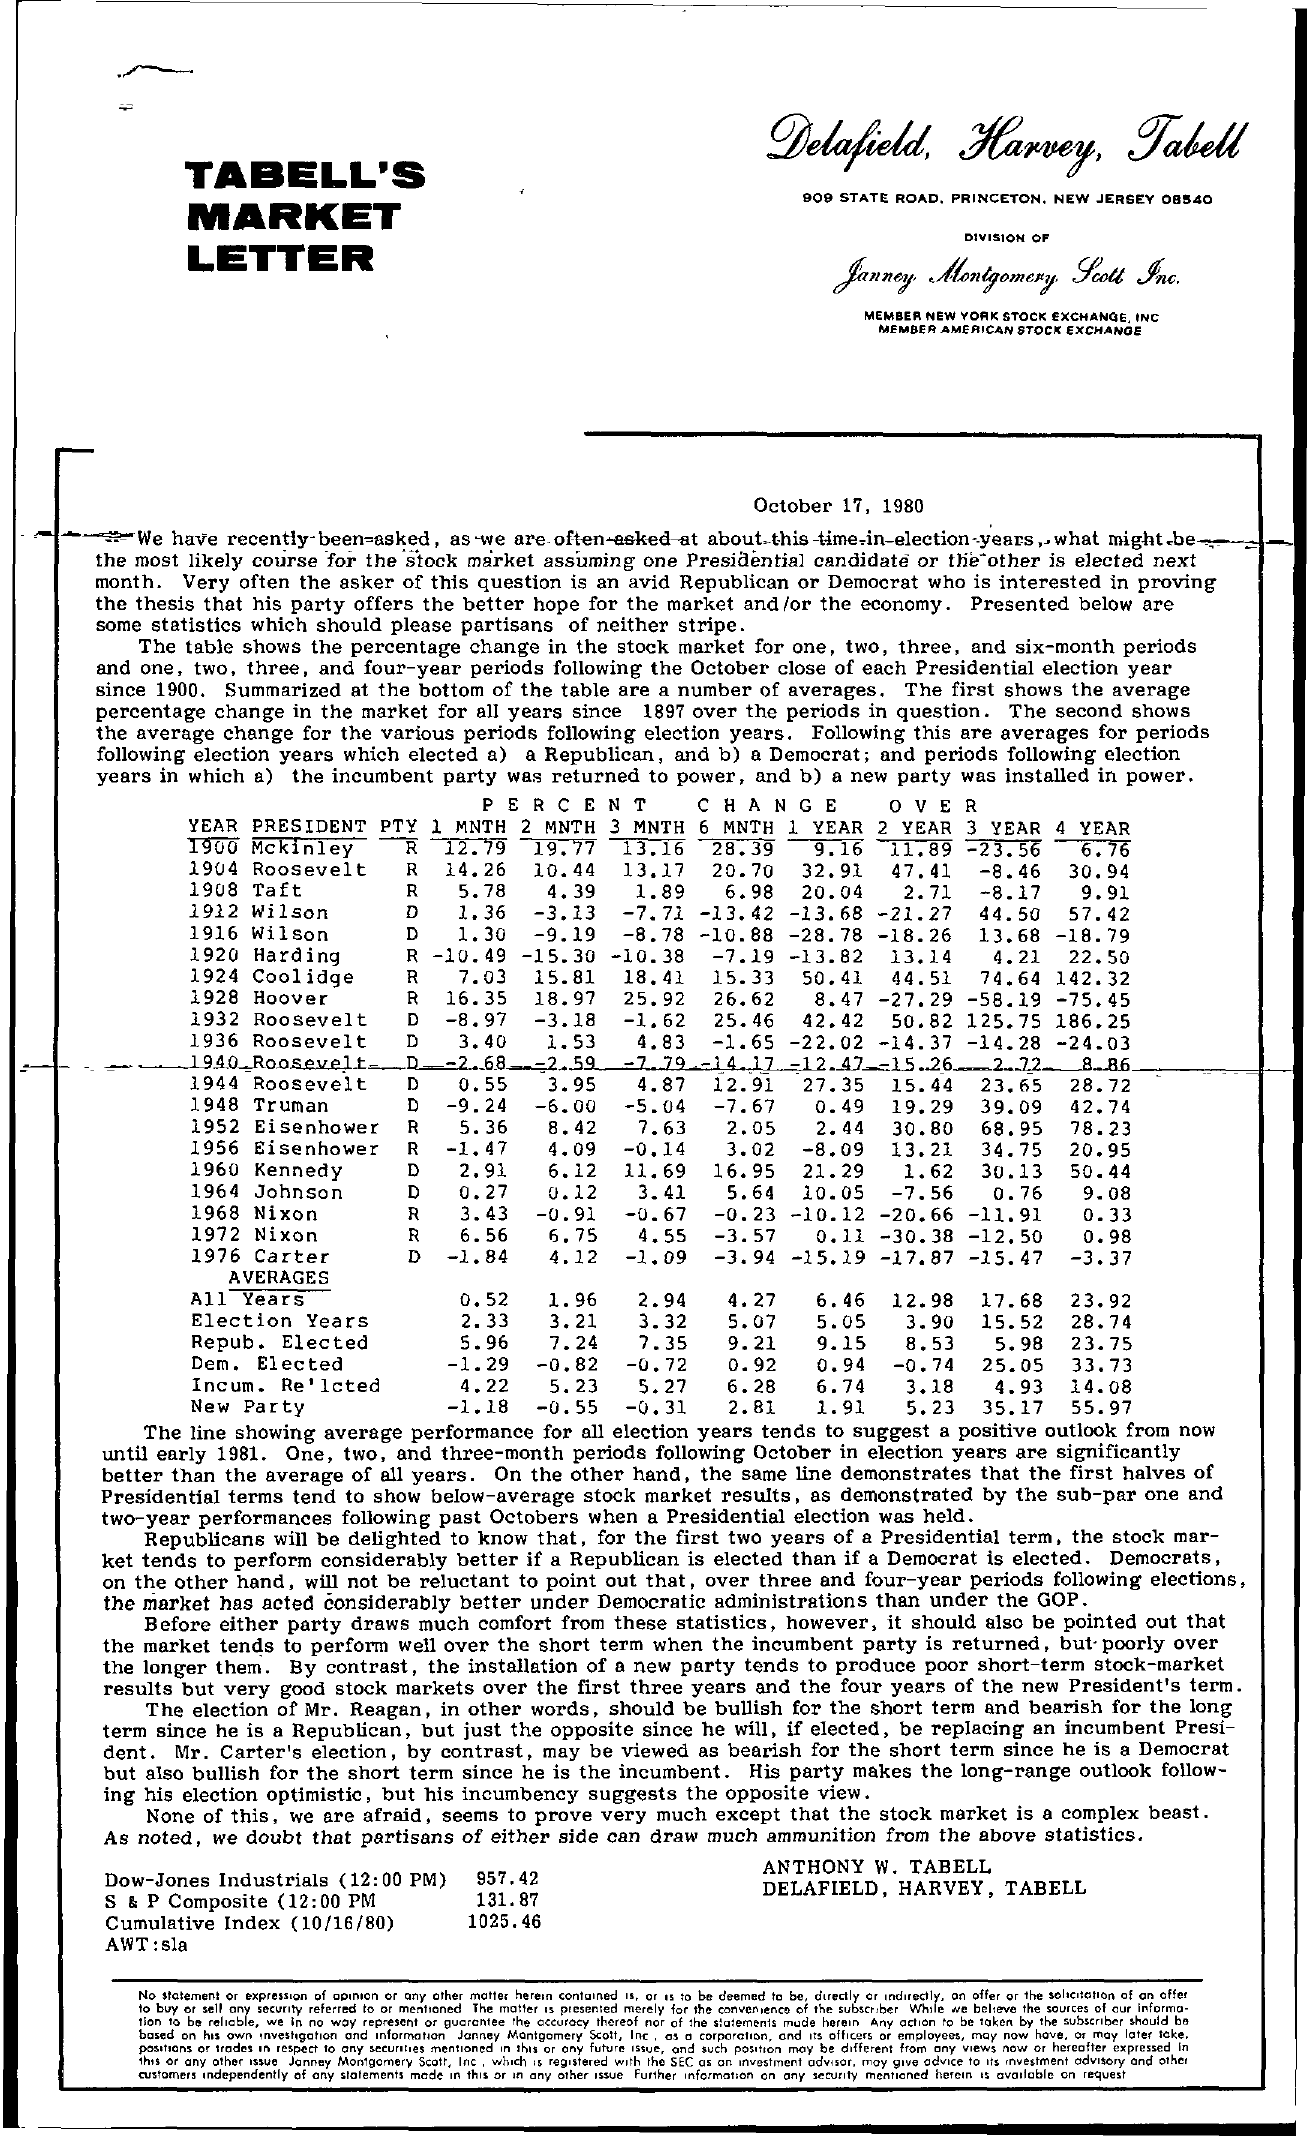 Tabell's Market Letter - October 17, 1980